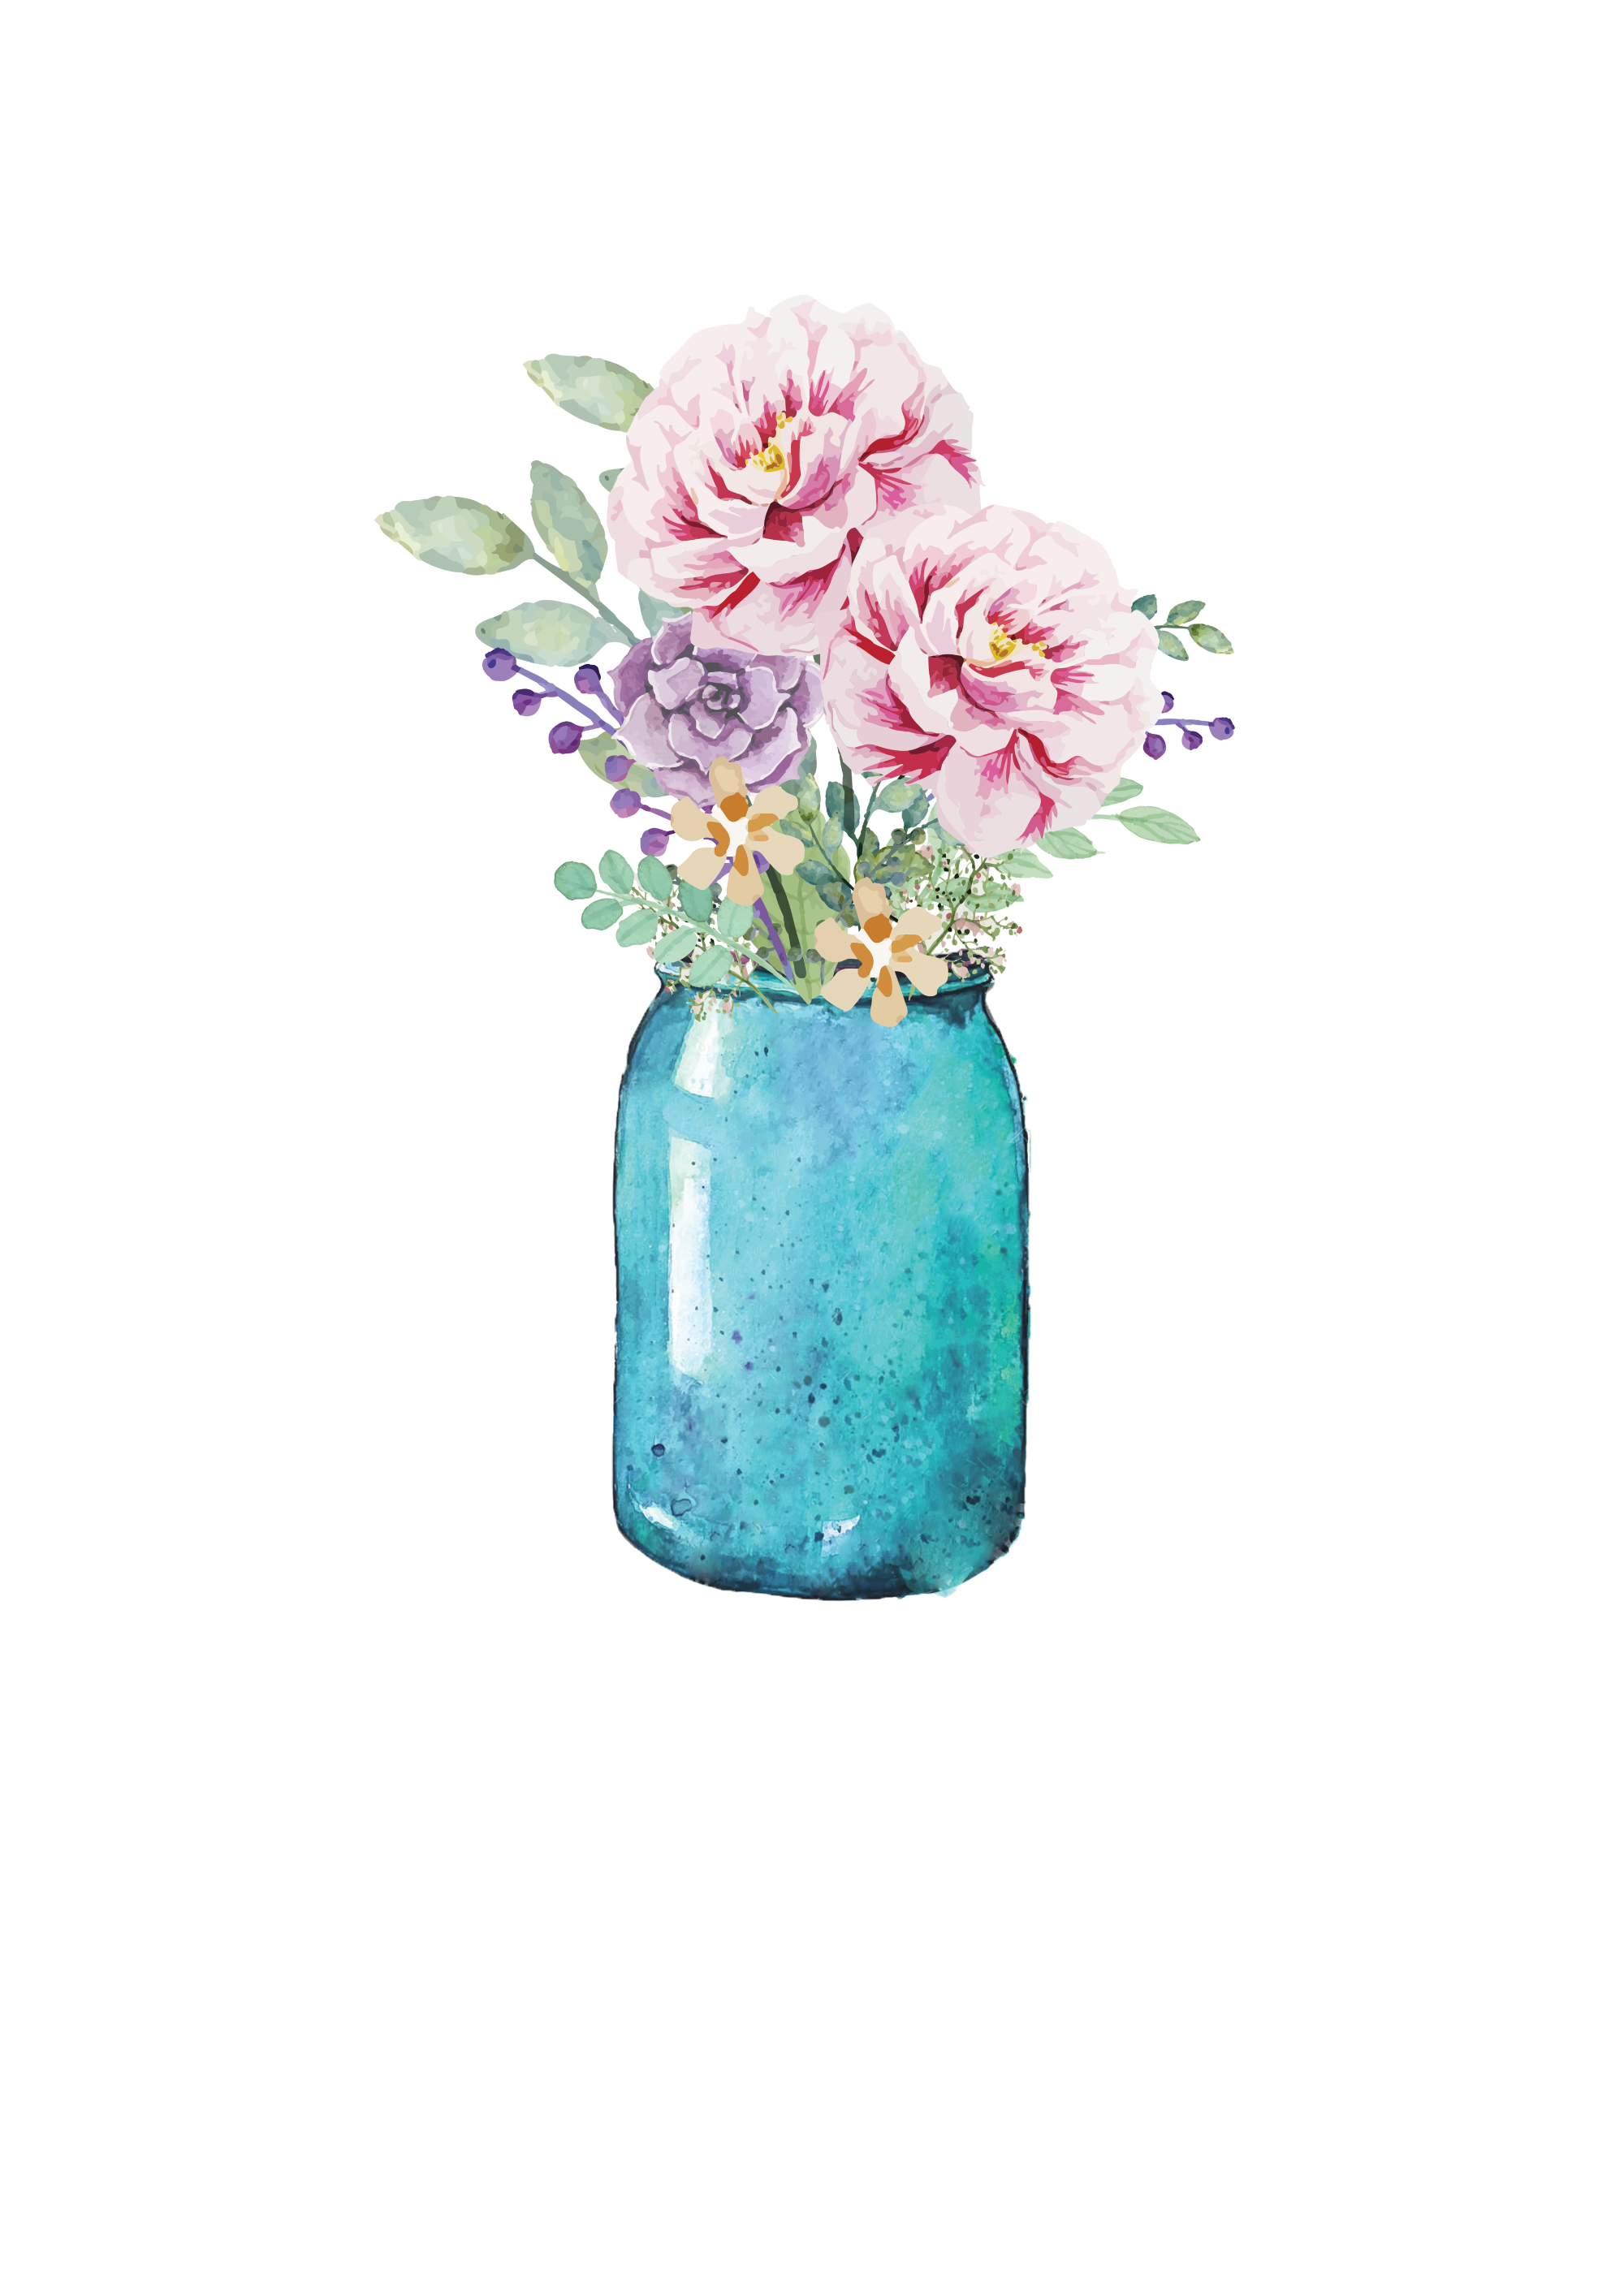 Mason jar blue flower clipart graphic library library Lauren Baxter : Flowers in a Mason Jar | Wallpaper | Pinterest | Jar ... graphic library library